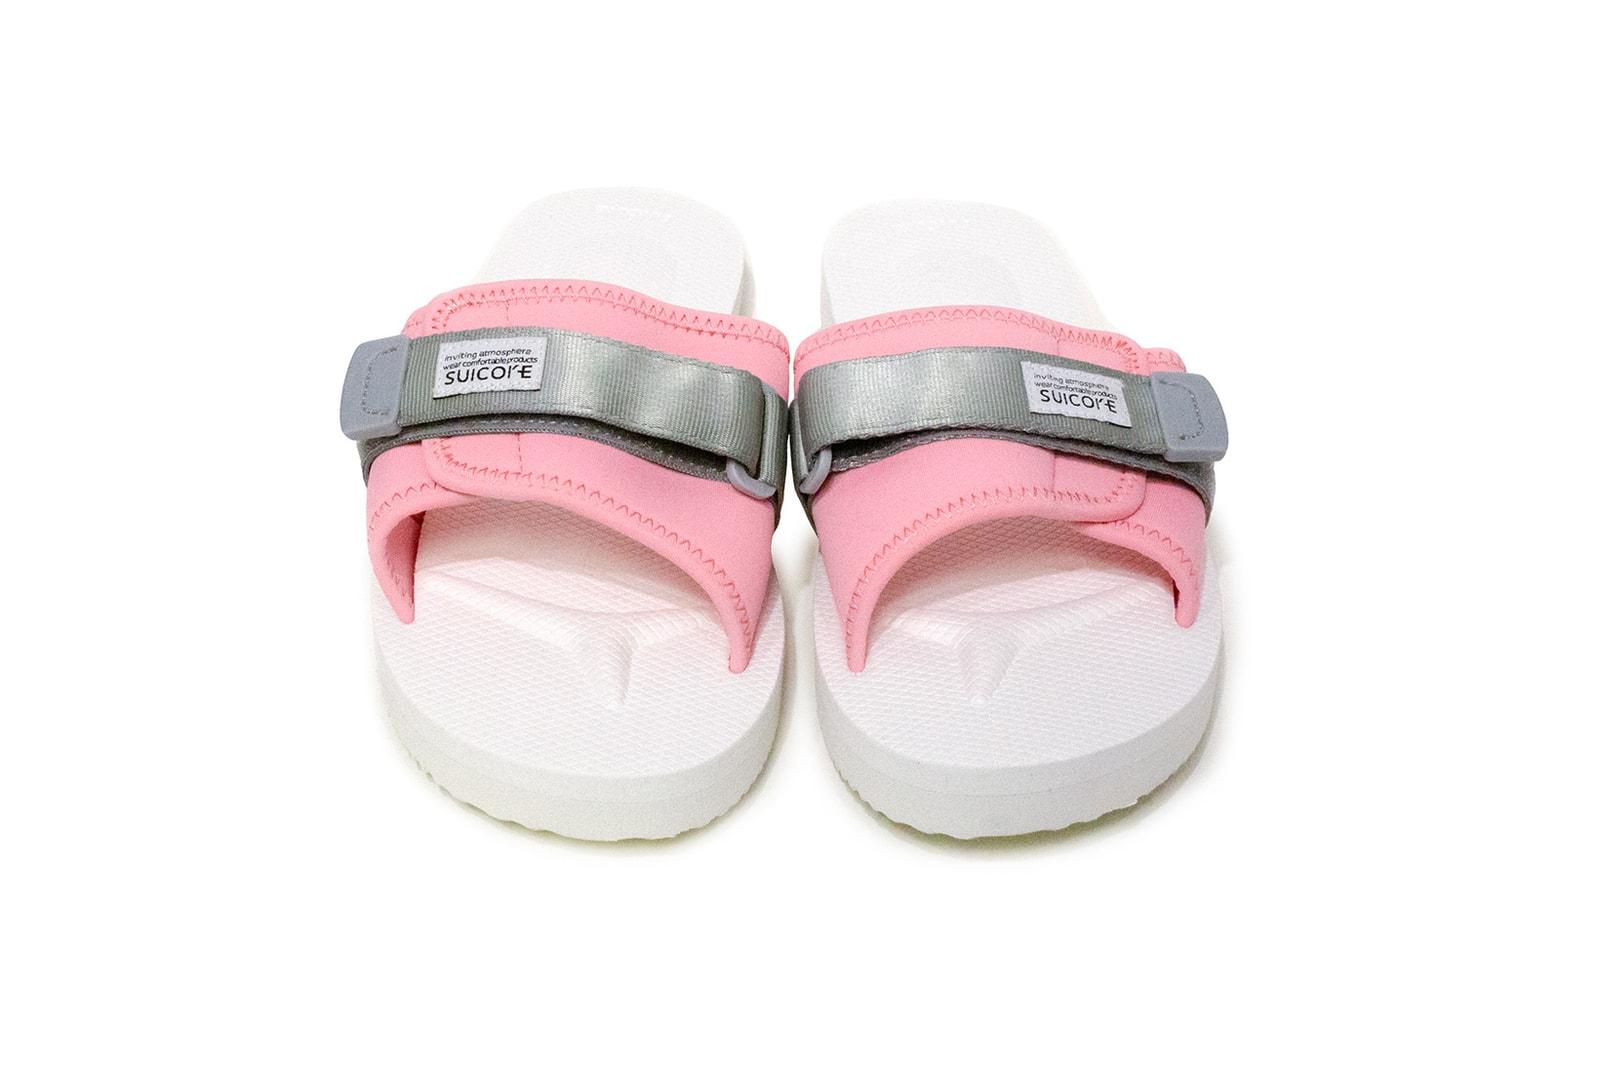 suicoke sandals slides cherry blossom pastel pink moto cab kisee vpo padri white summer shoes release